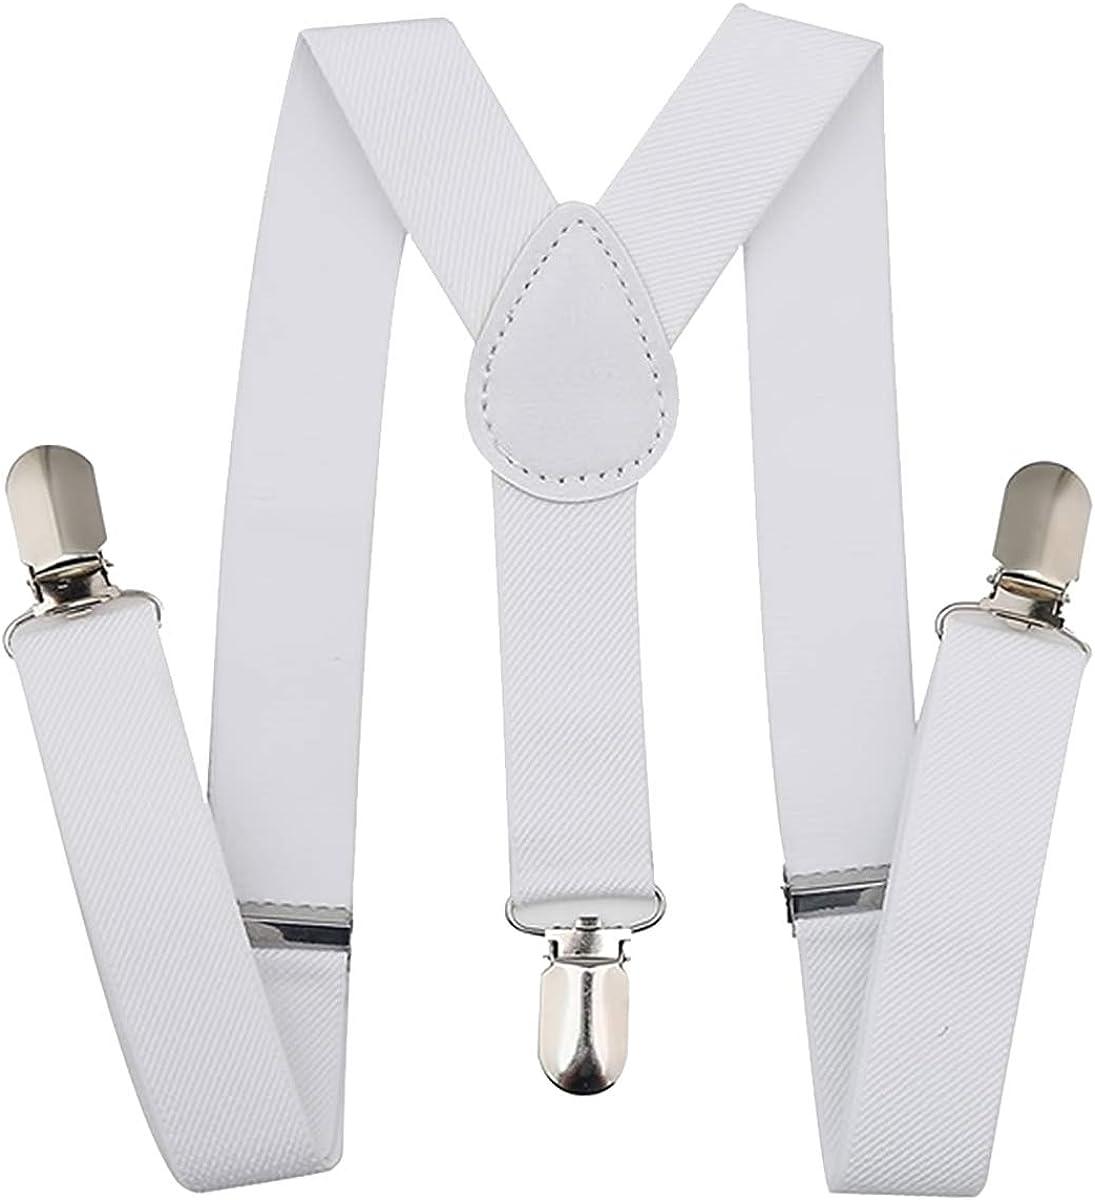 Trimming Shop Men's 25mm Wide Braces Suspenders Elastic